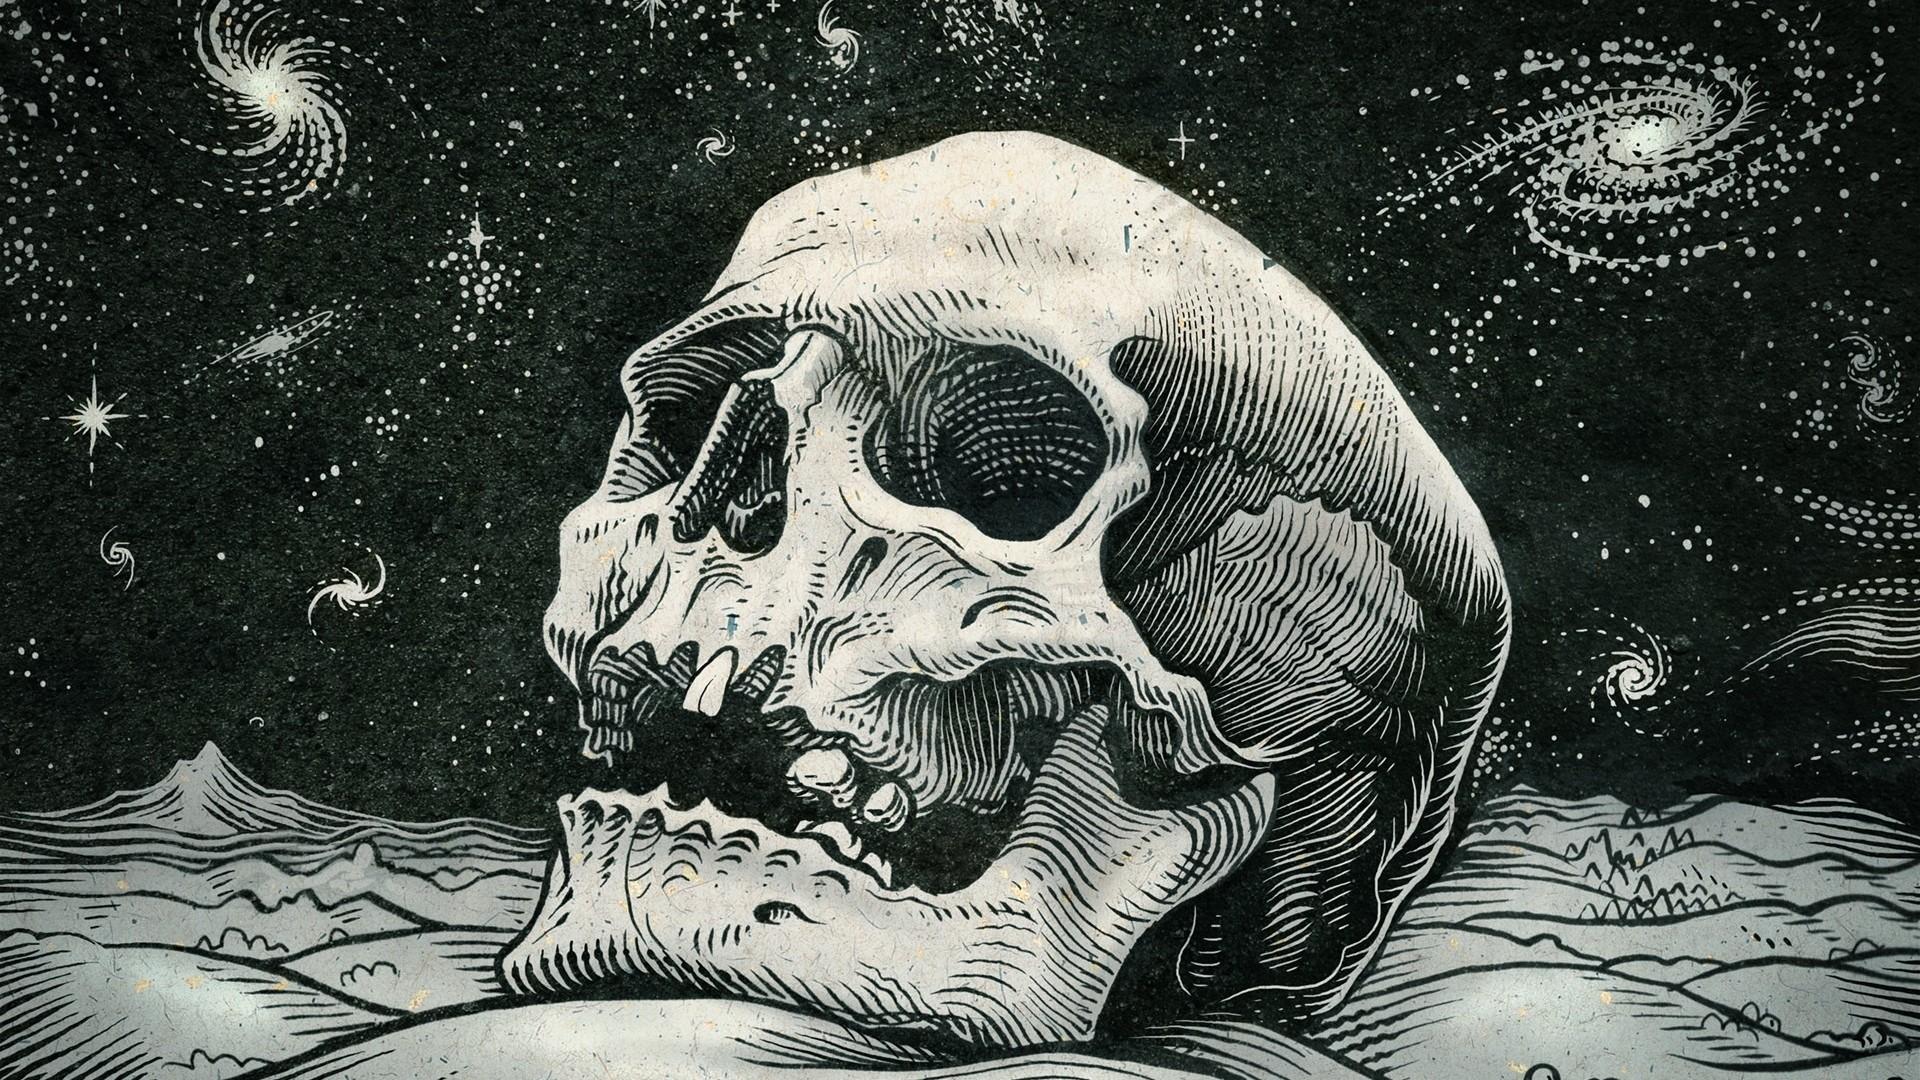 gothic skull wallpaper  u00b7 u2460 fish skeleton logo restaurant fish skeleton logo meaning